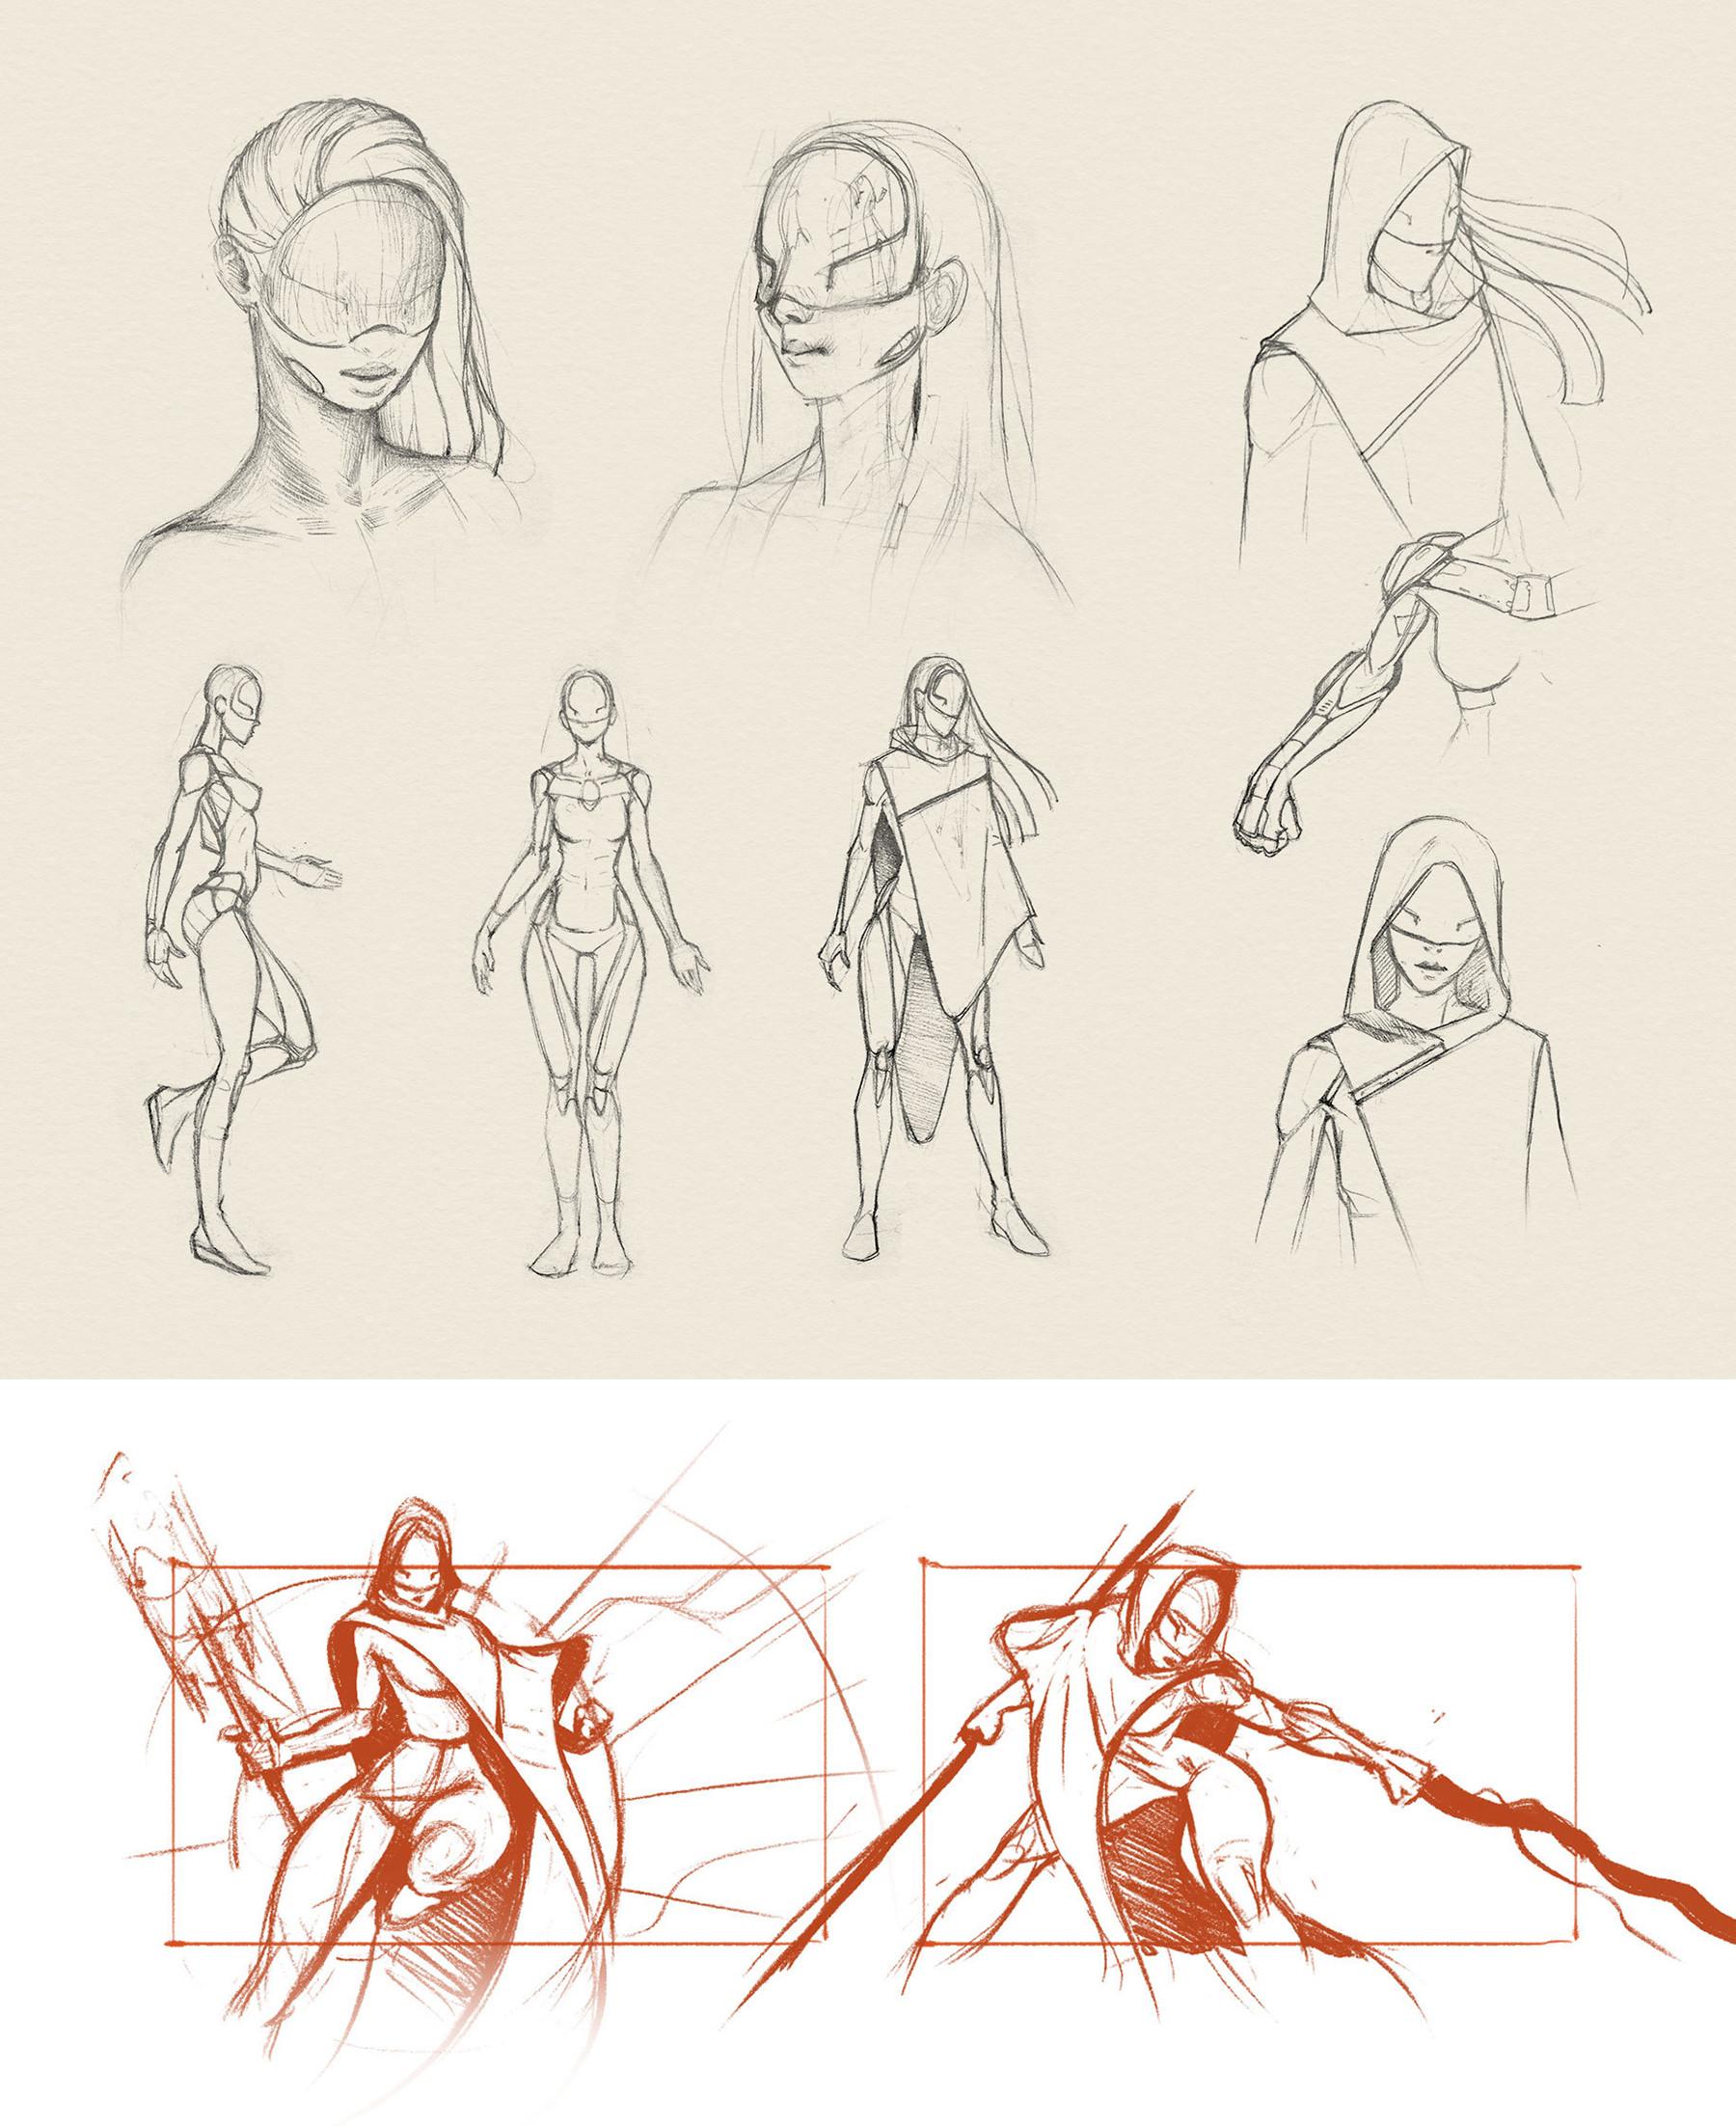 Sergey grunin sketch 2